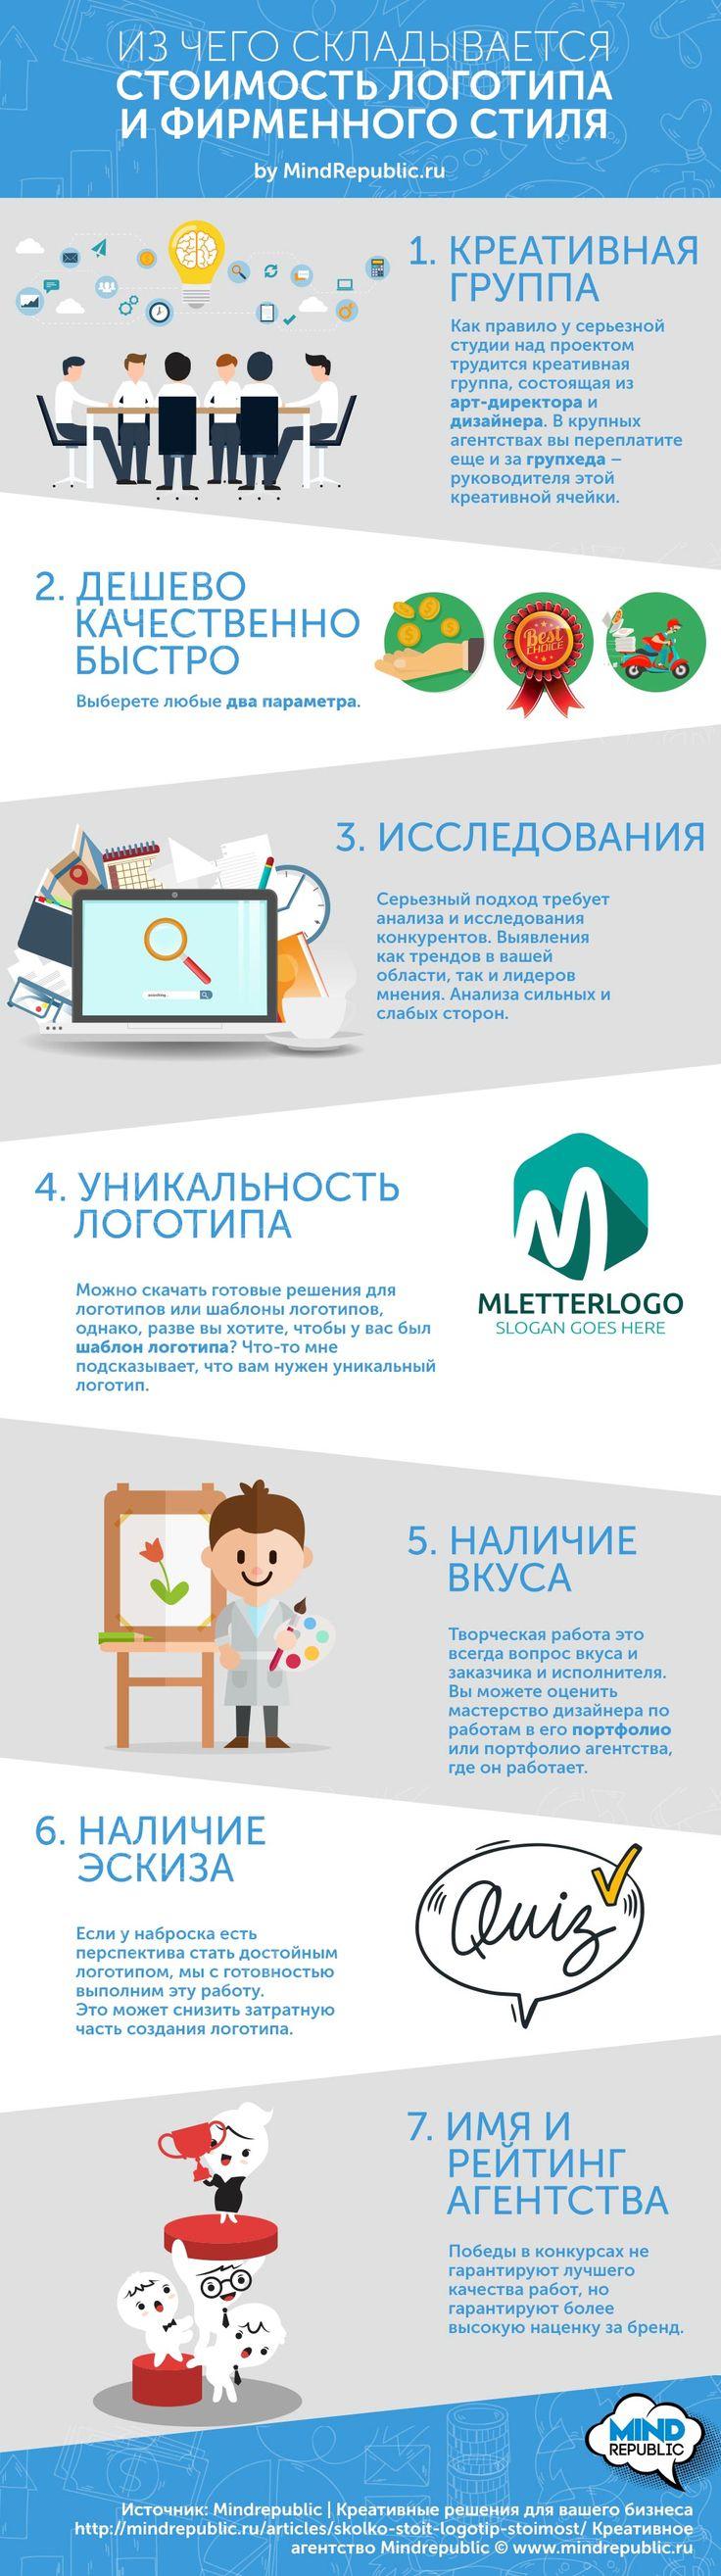 skolko-stoit-logotip-i-pochemu-logotip-stoimost-infografika Инфографика. Сколько стоит логотип. Процесс создания логотипа